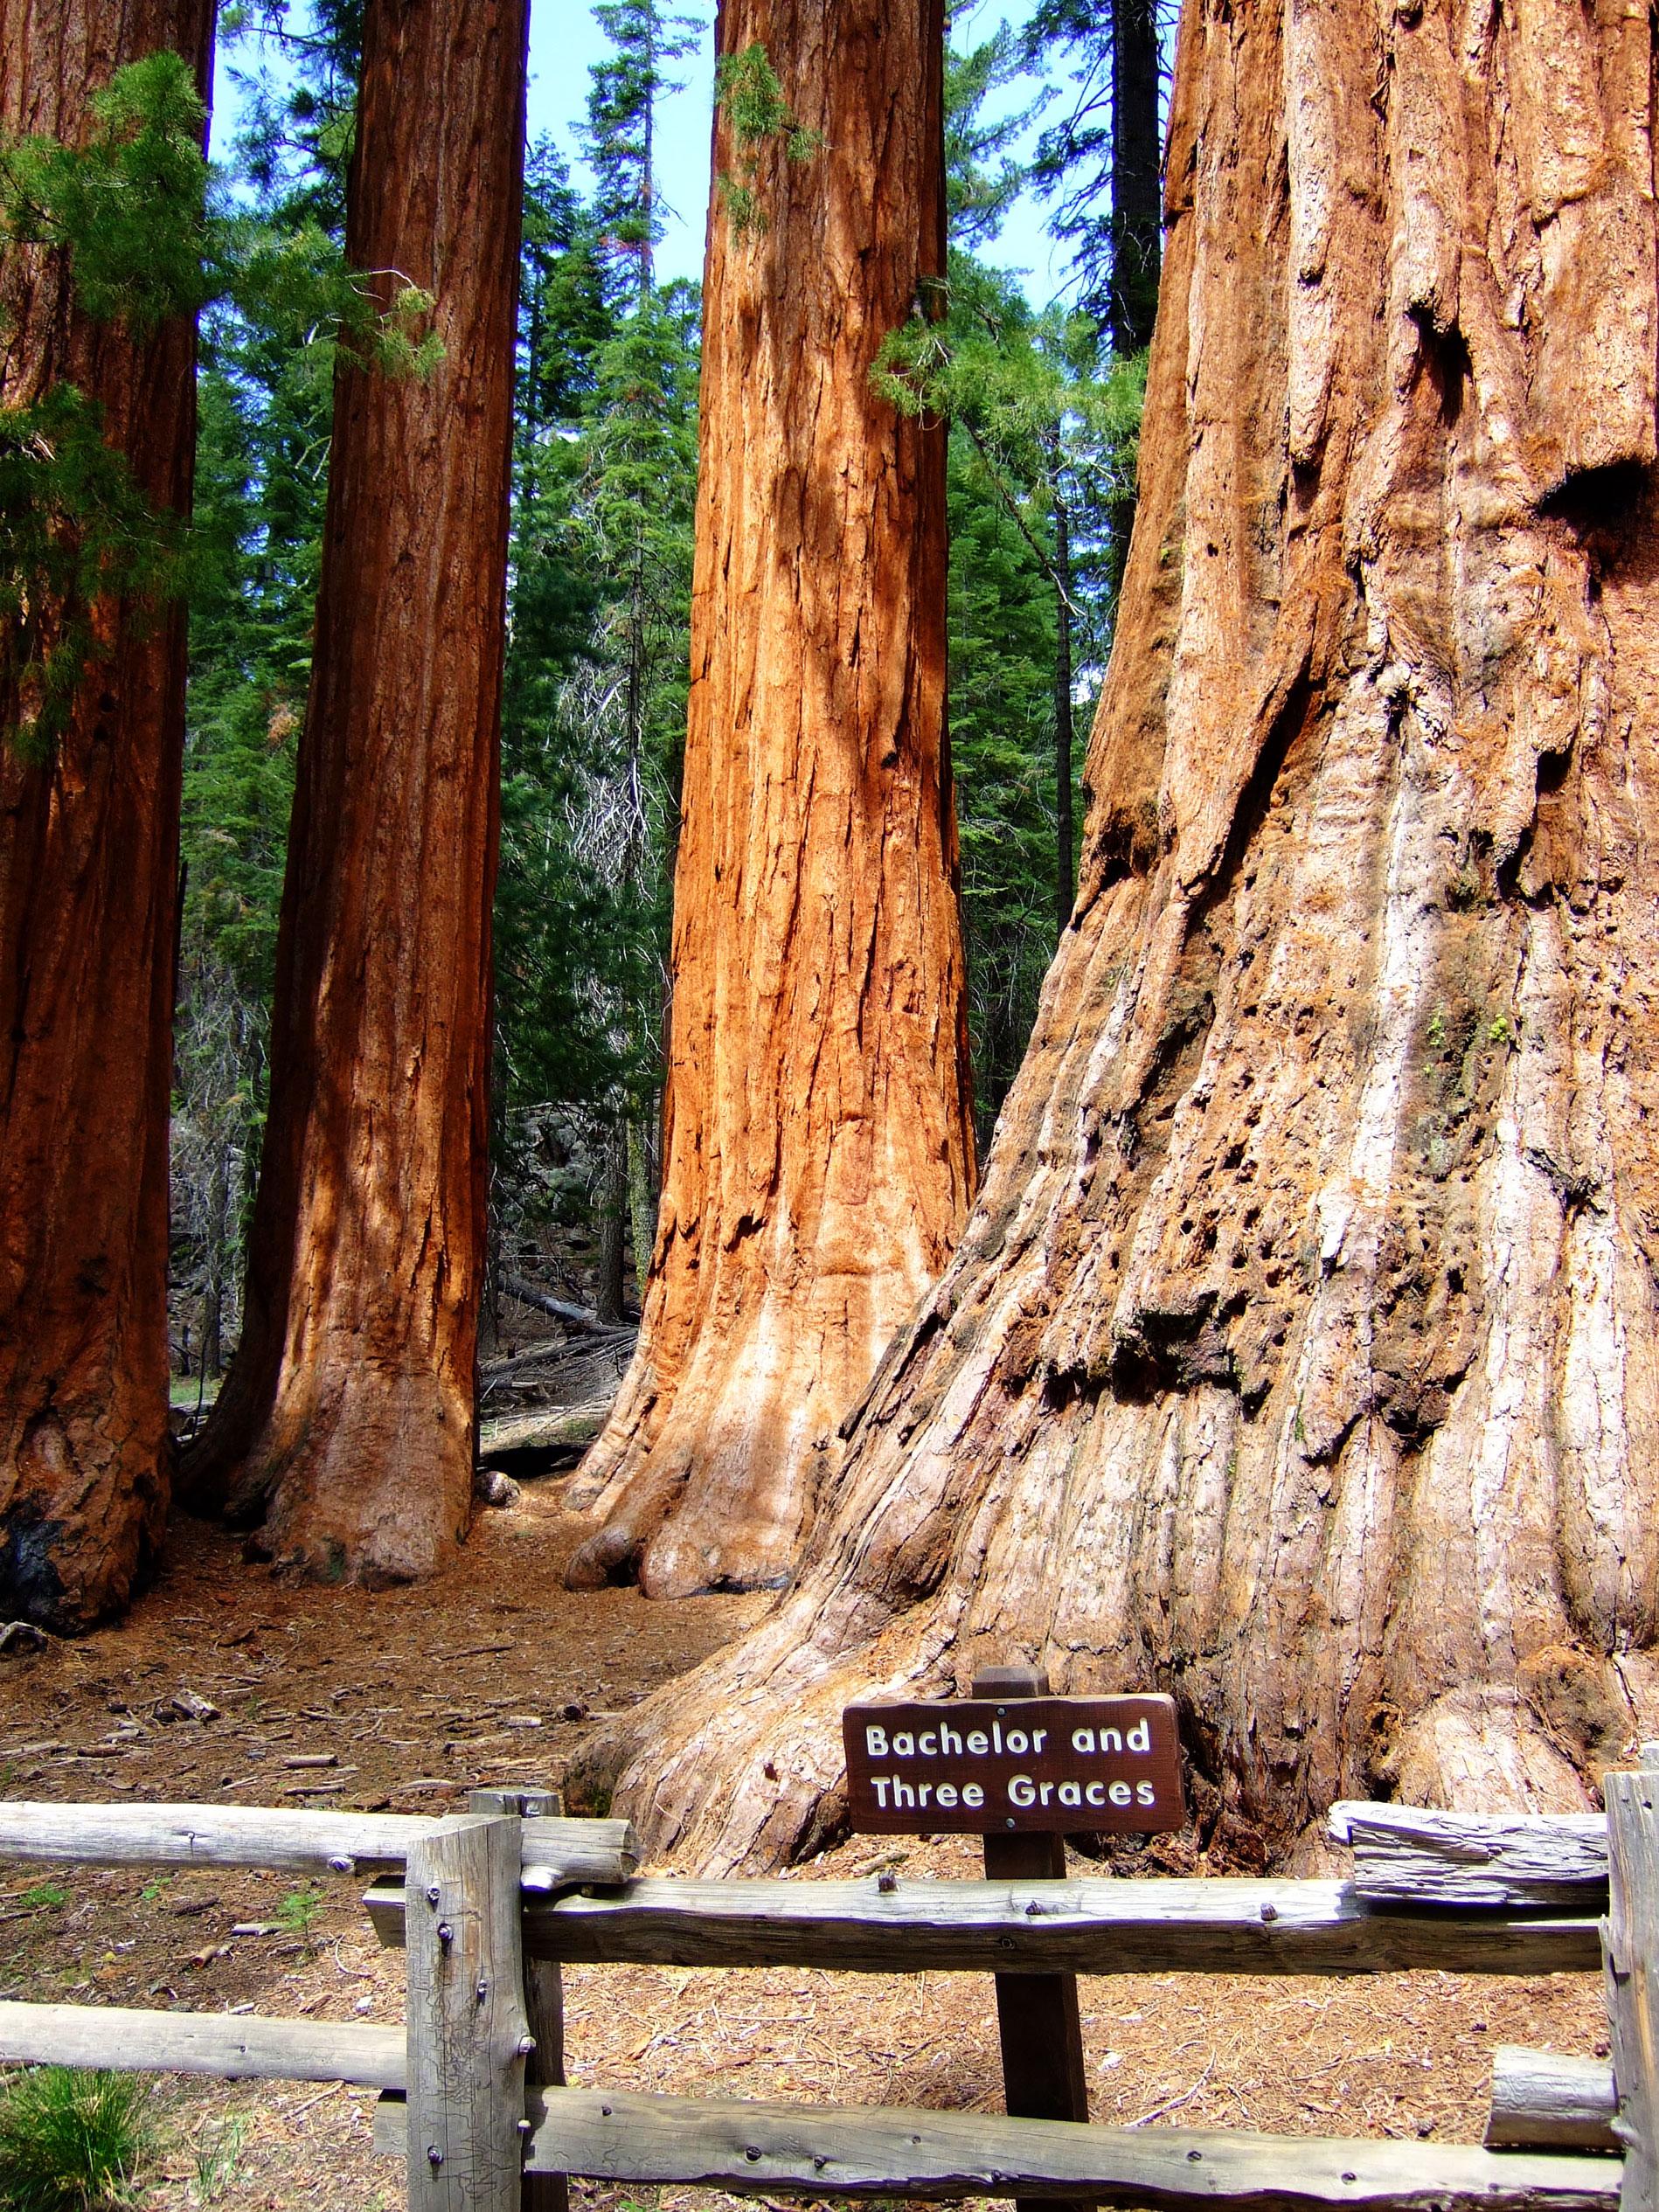 Yosemite Vacation 10 Fun Things To Do